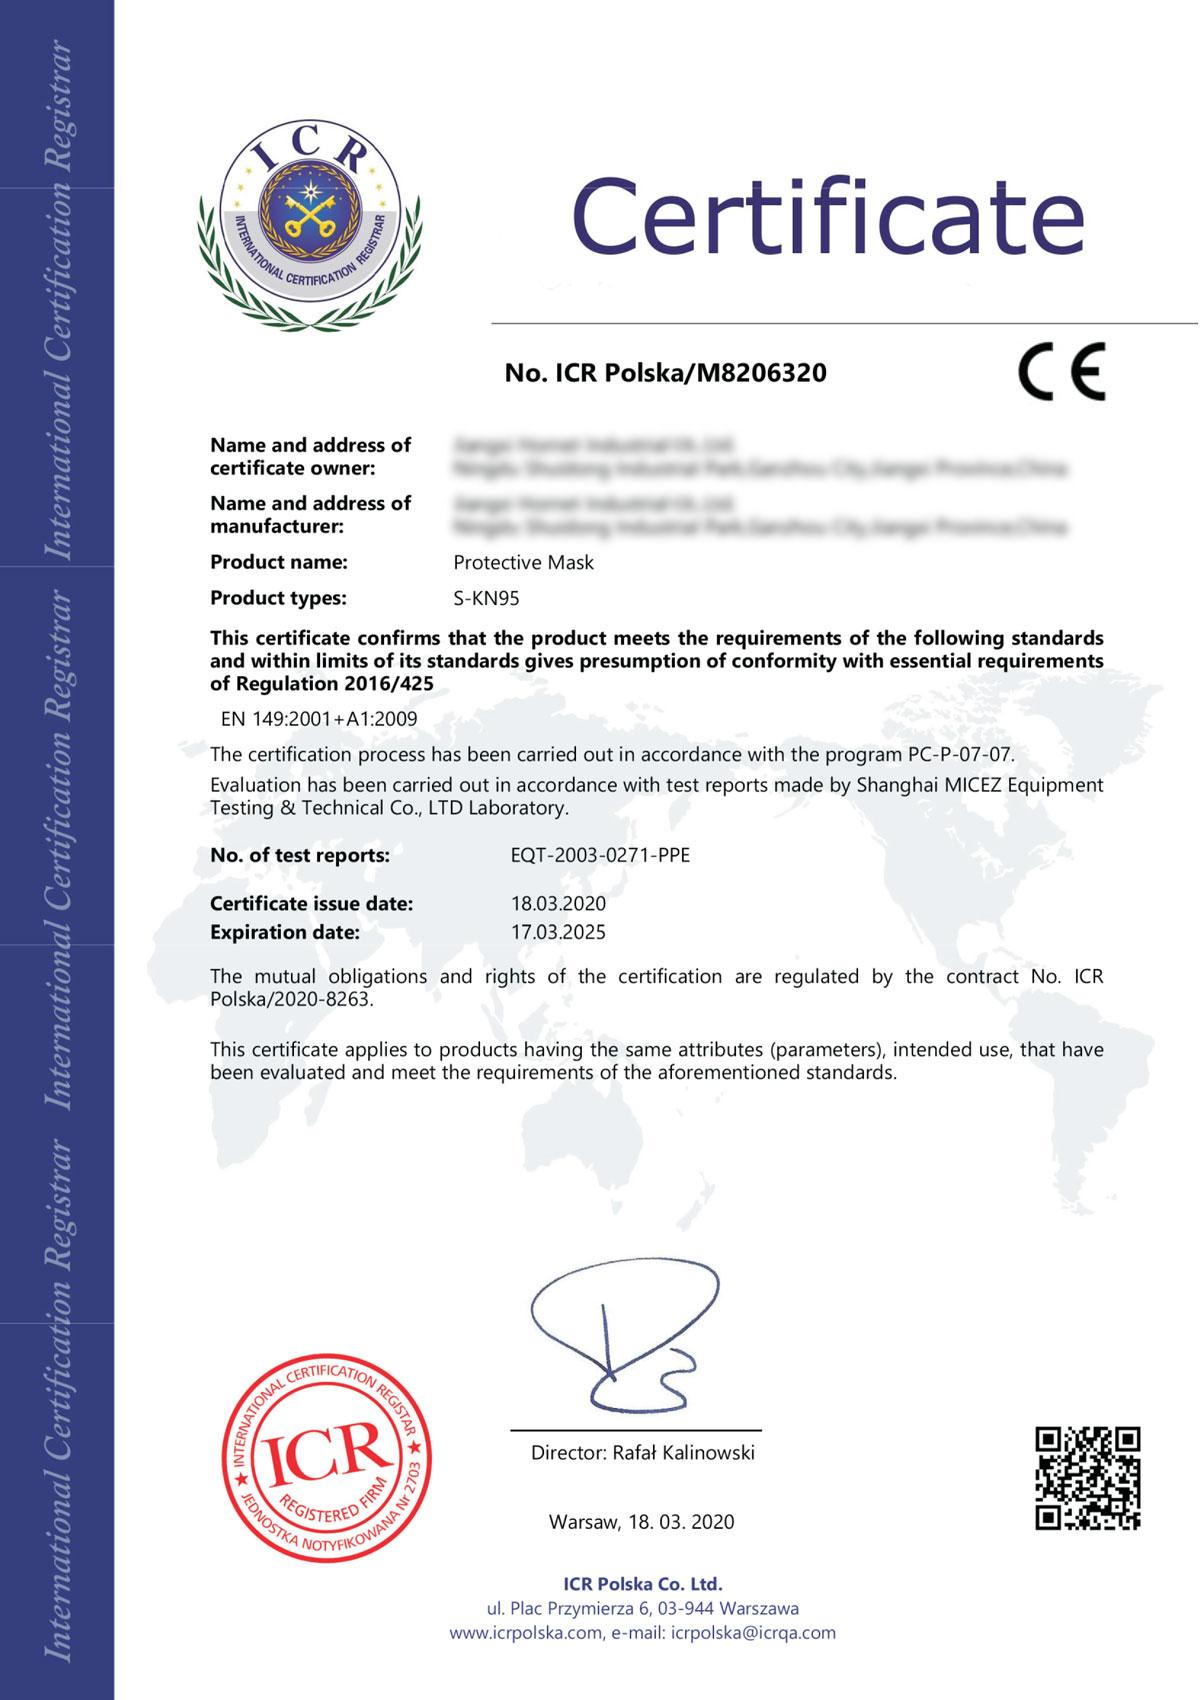 Certificat Masca Coronavirus S-KN95 / N95 / FFP2